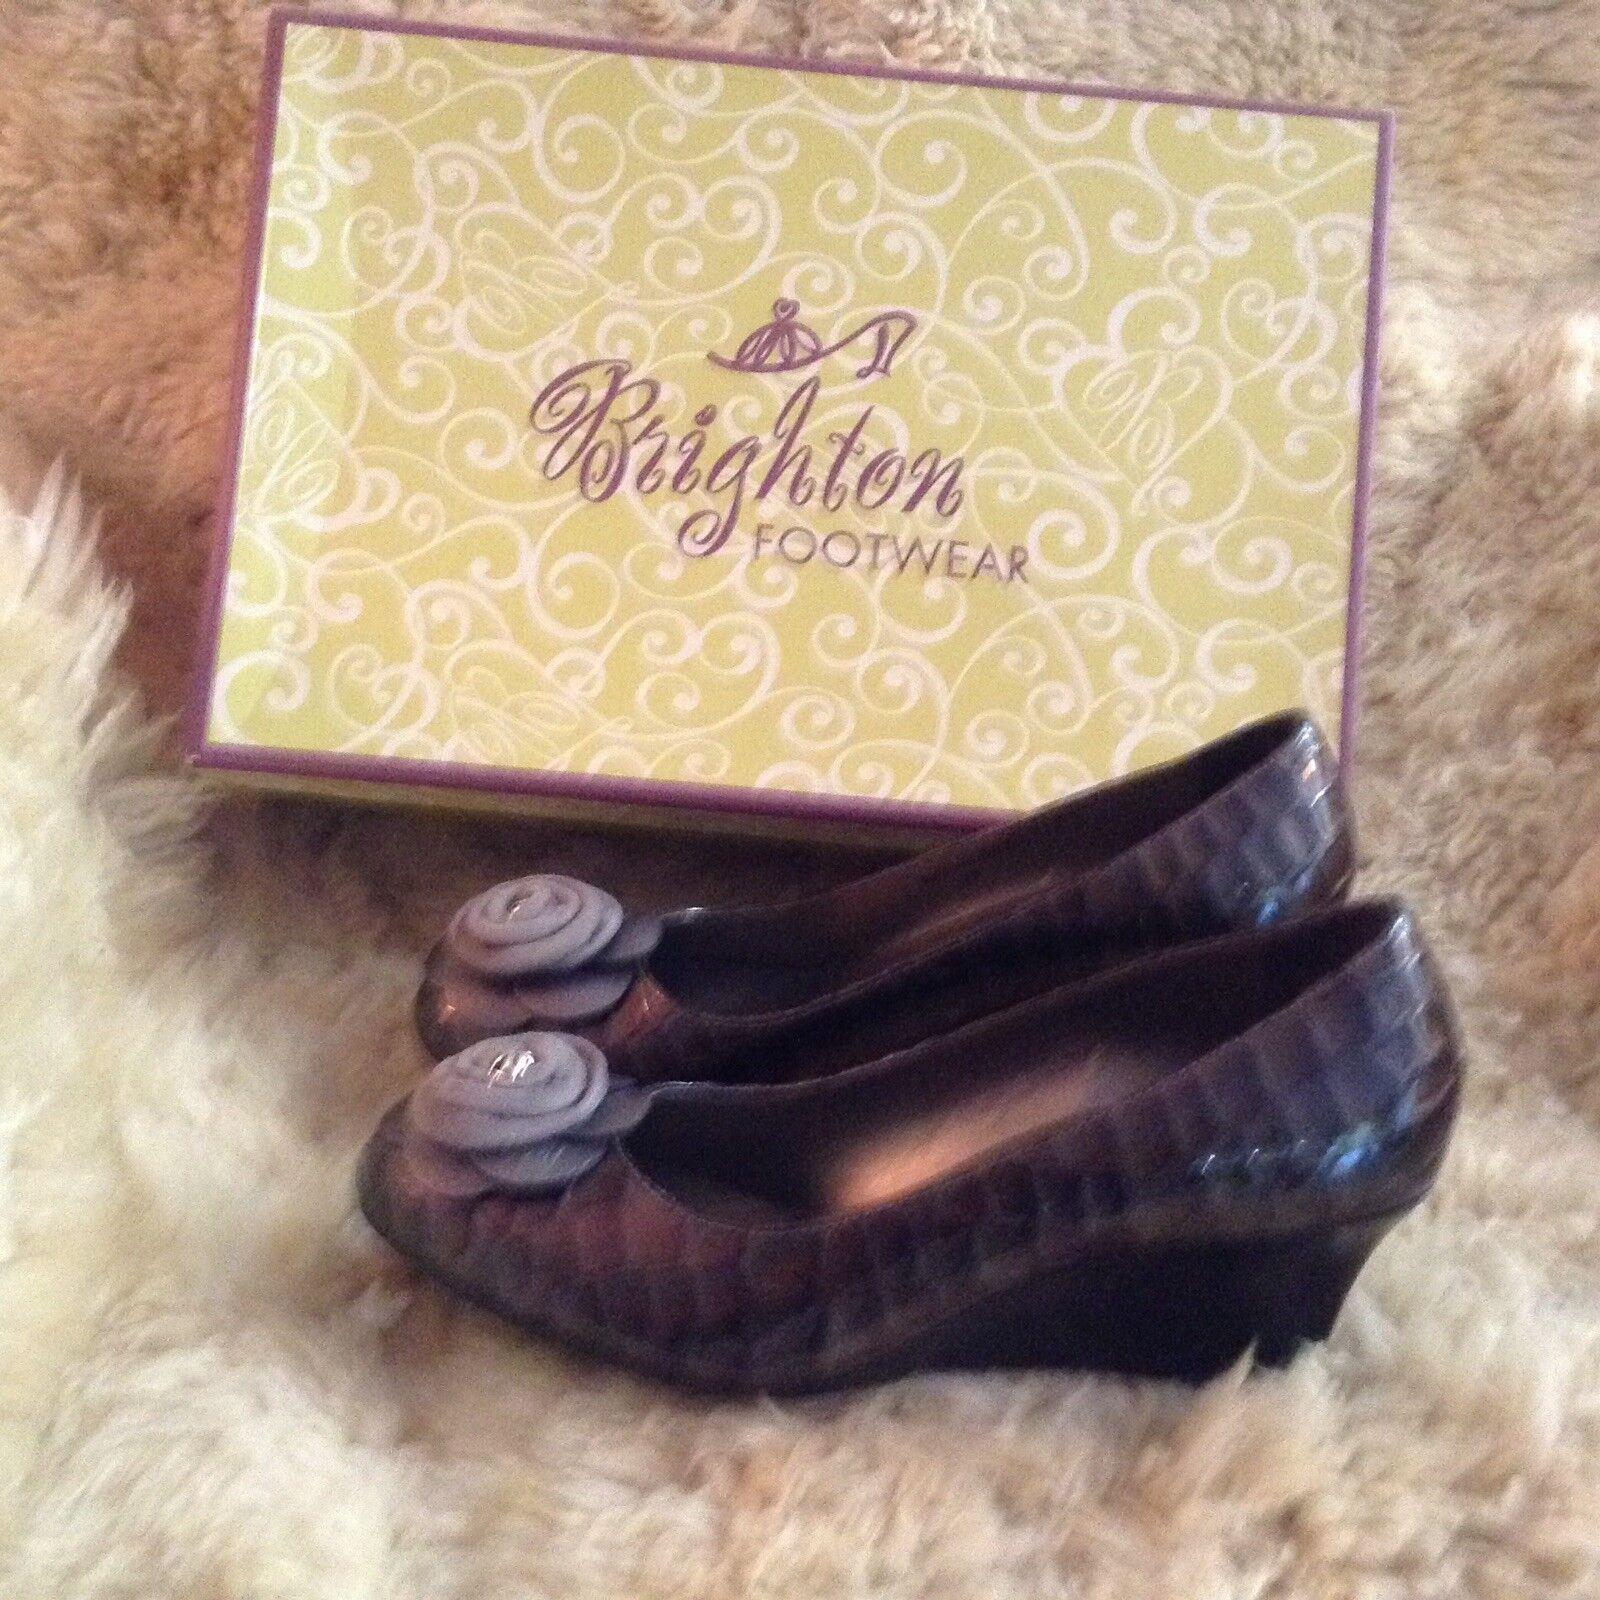 Brighton Women's shoes NIB size 9.5 9 1 2 harem pewter patent crocodile  leather